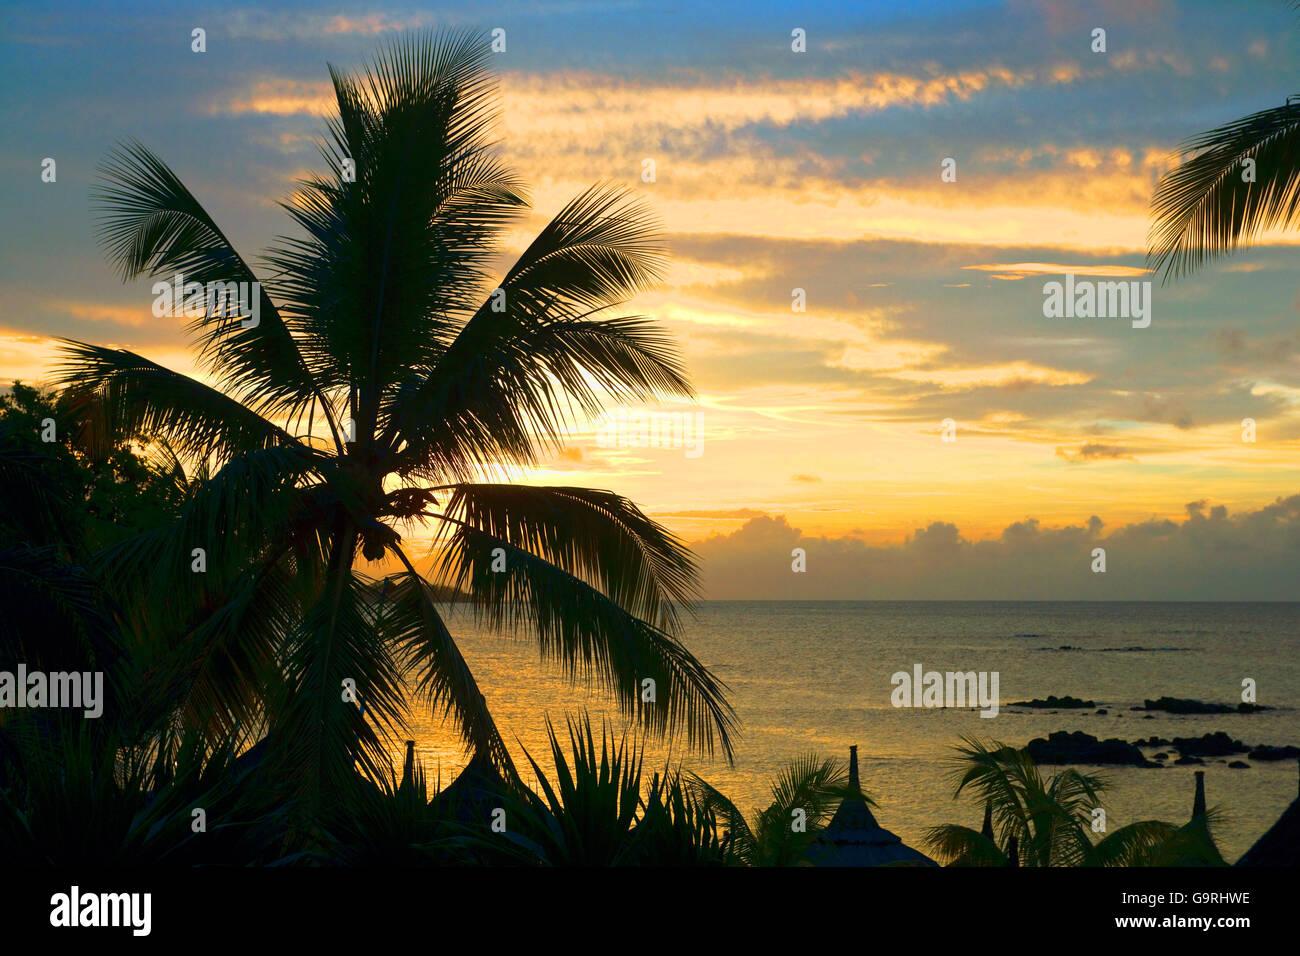 Sunset / Mauritius, Africa, Indian Ocean - Stock Image